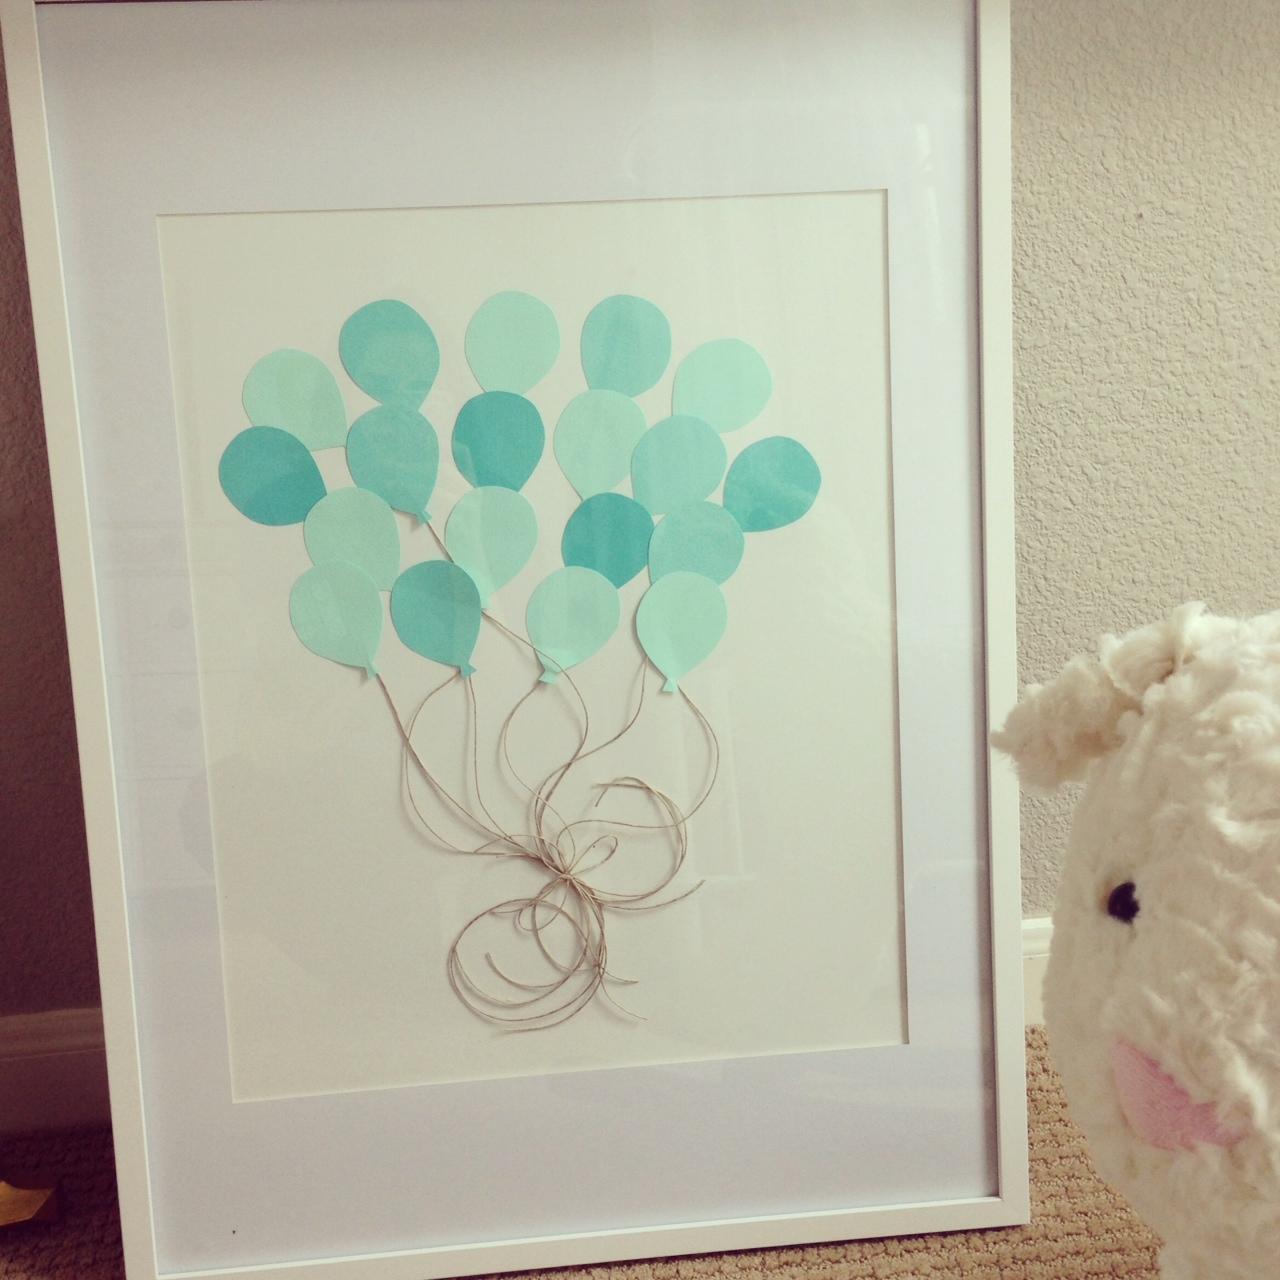 Diy Nursery Artwork Pretty Balloons